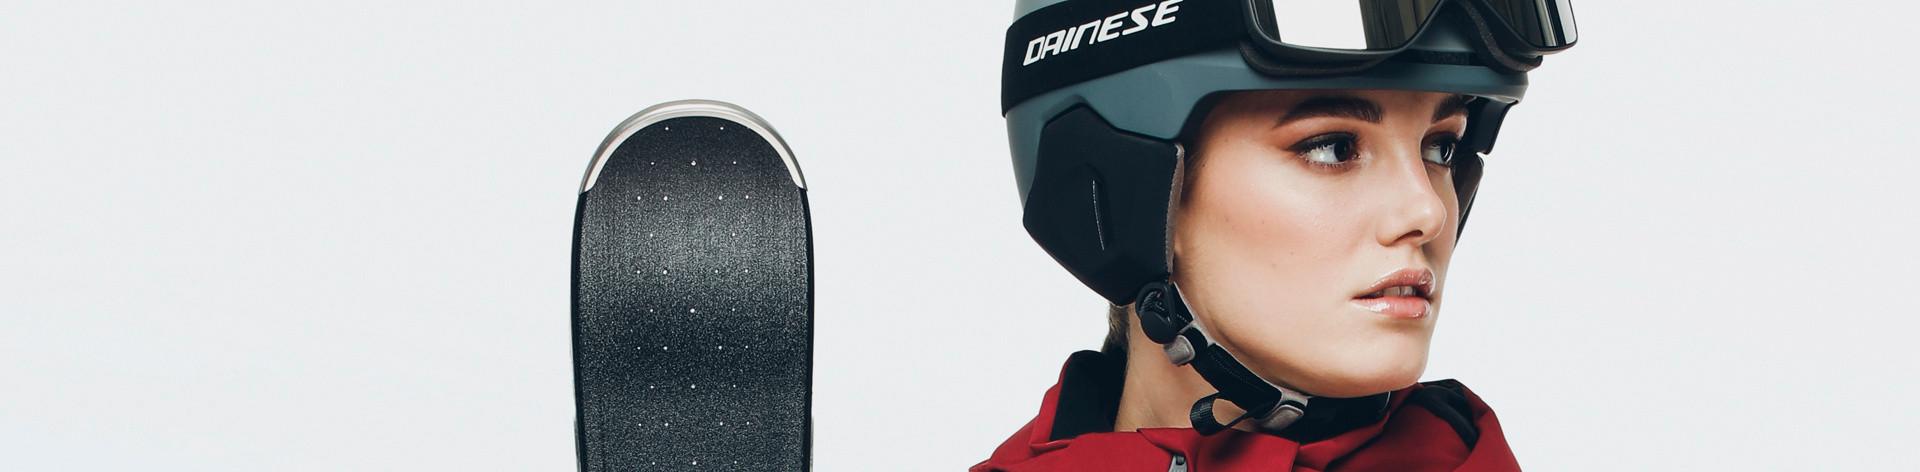 Dainese Winter Sports woman